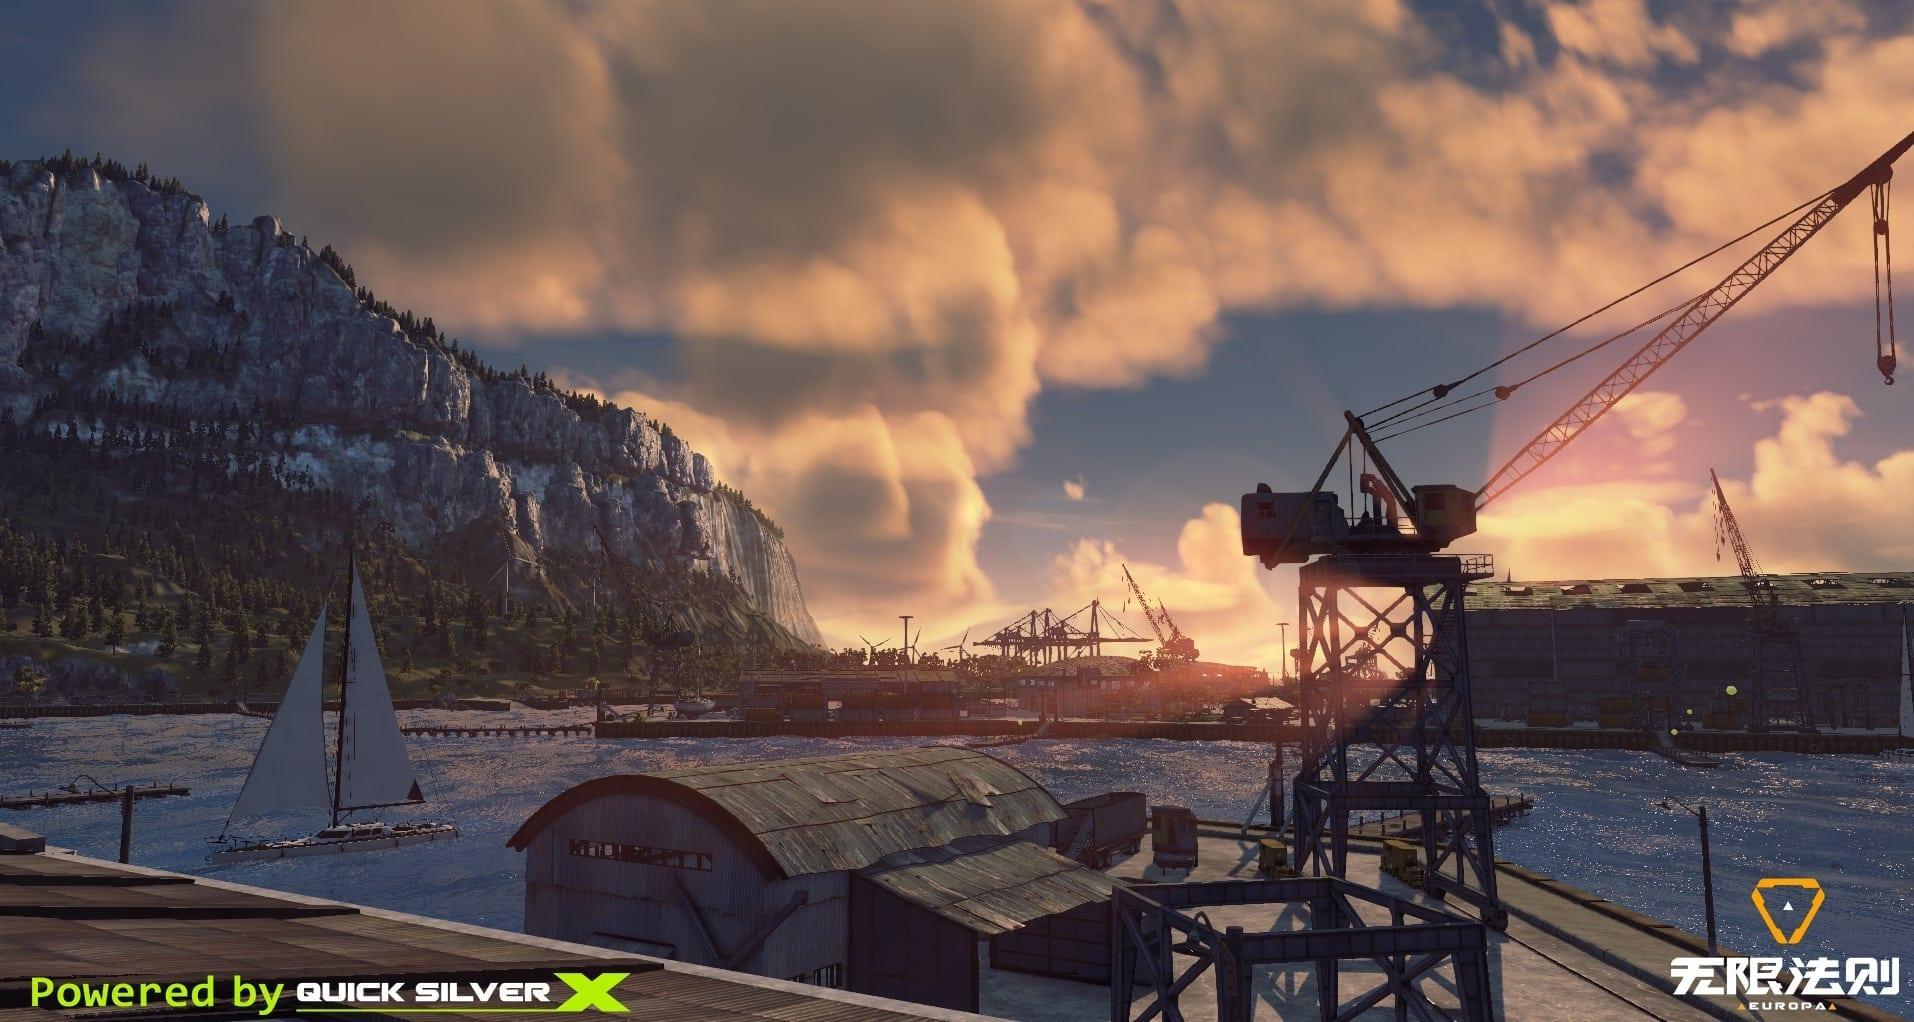 Europa Tencent Games Reveal Next Gen Battle Royale Title MMO Culture